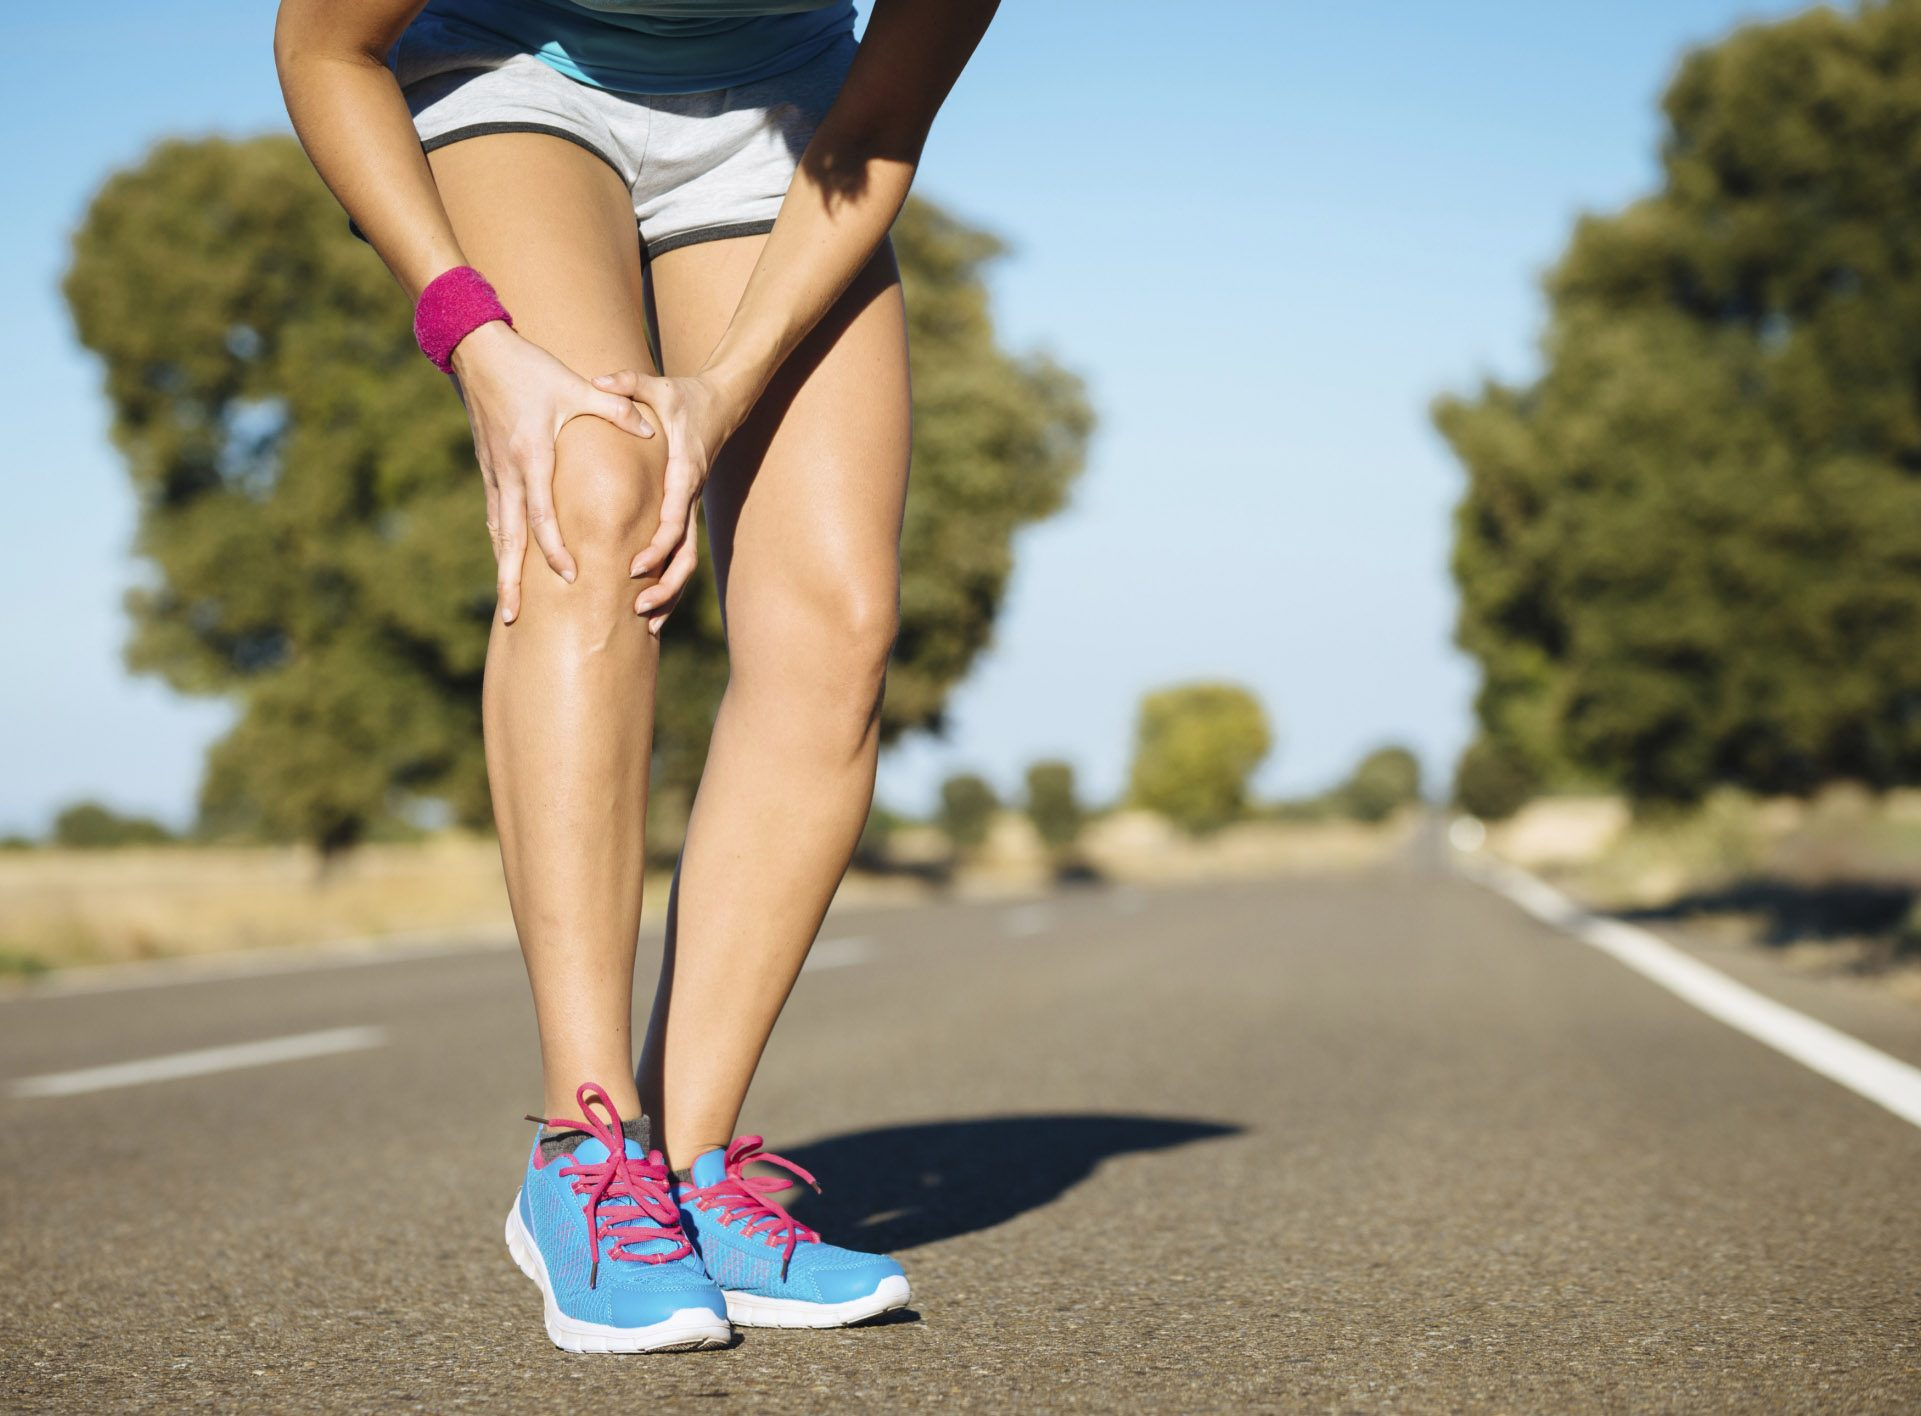 5 Tips to Make Life With Arthritis Pain Easier